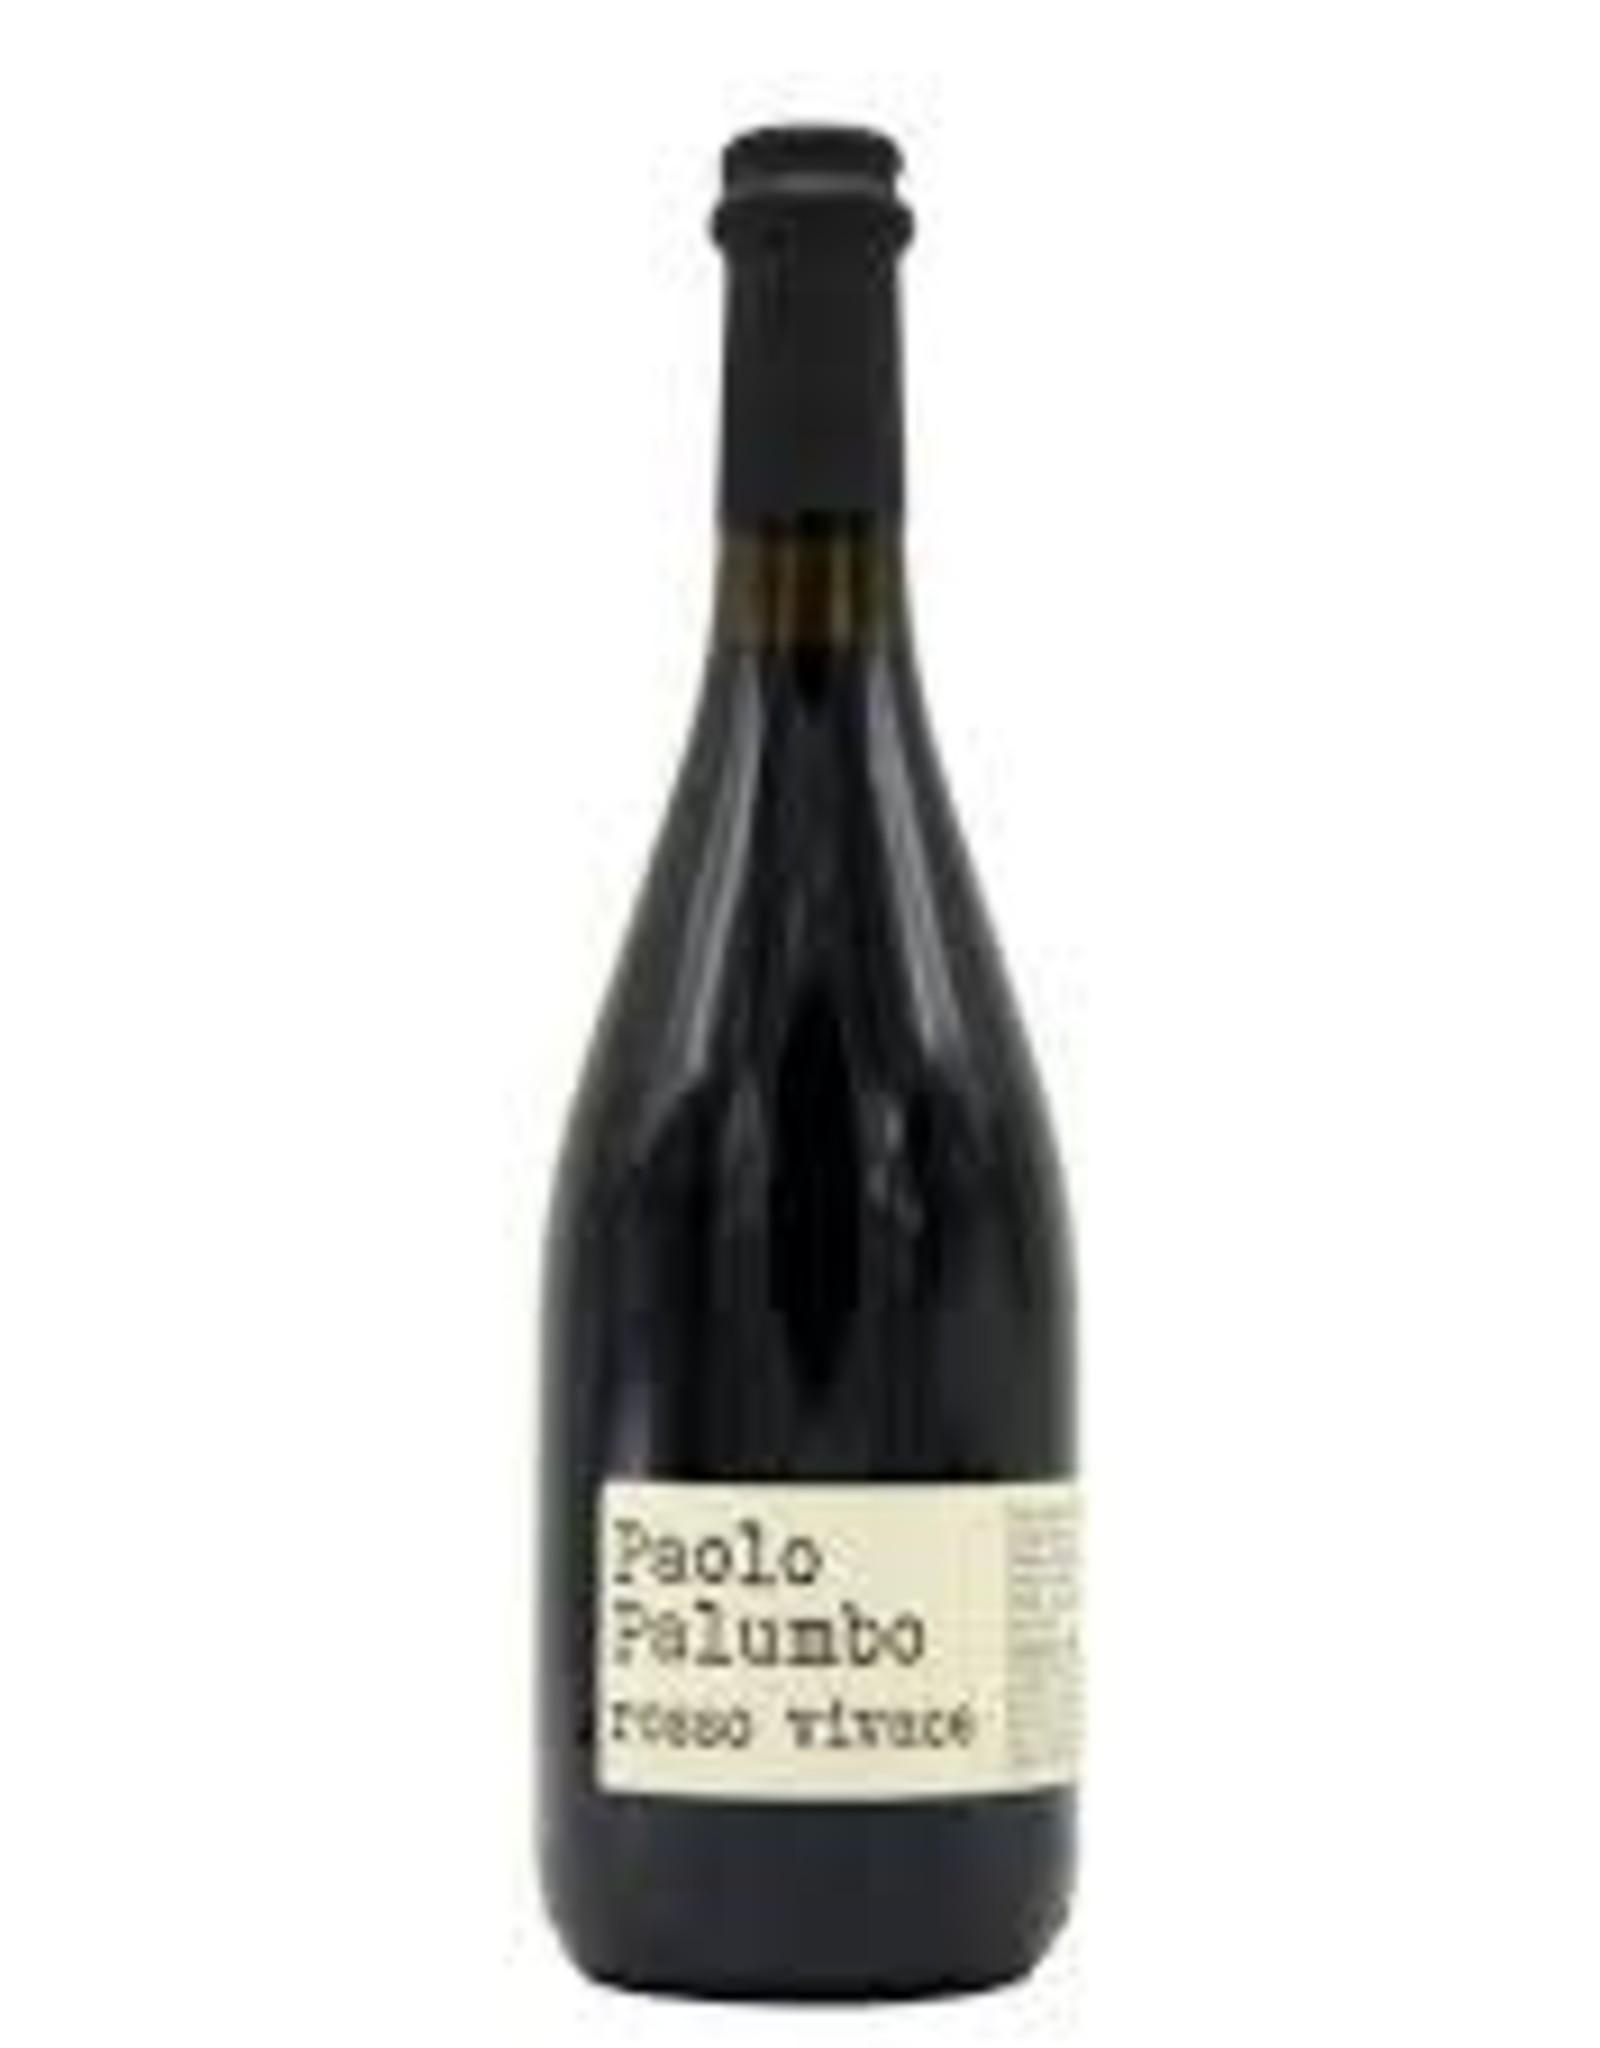 Sparkling Aglianico, Paolo Palumbo Rosso Vivace